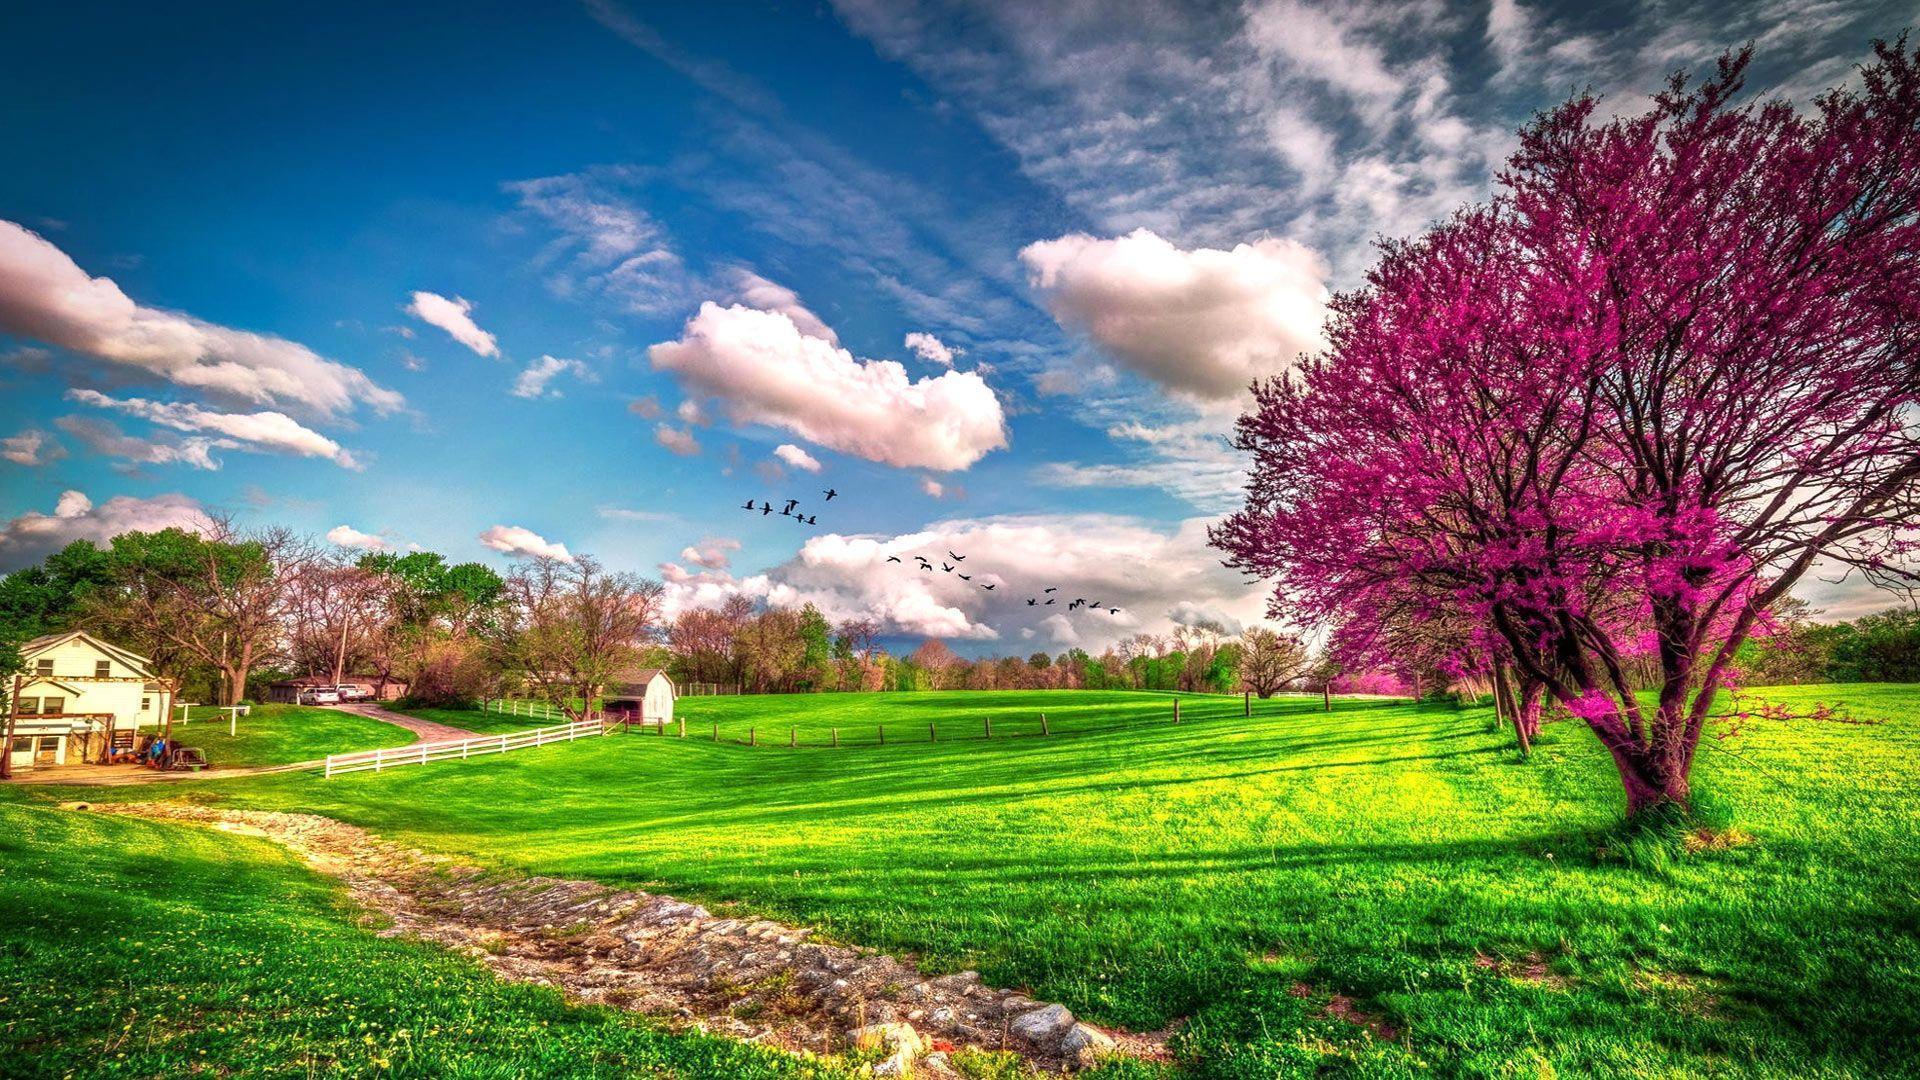 beautiful-spring-scenery-wallpapers-hd-1080p-1920x1080-desktop-03.jpg